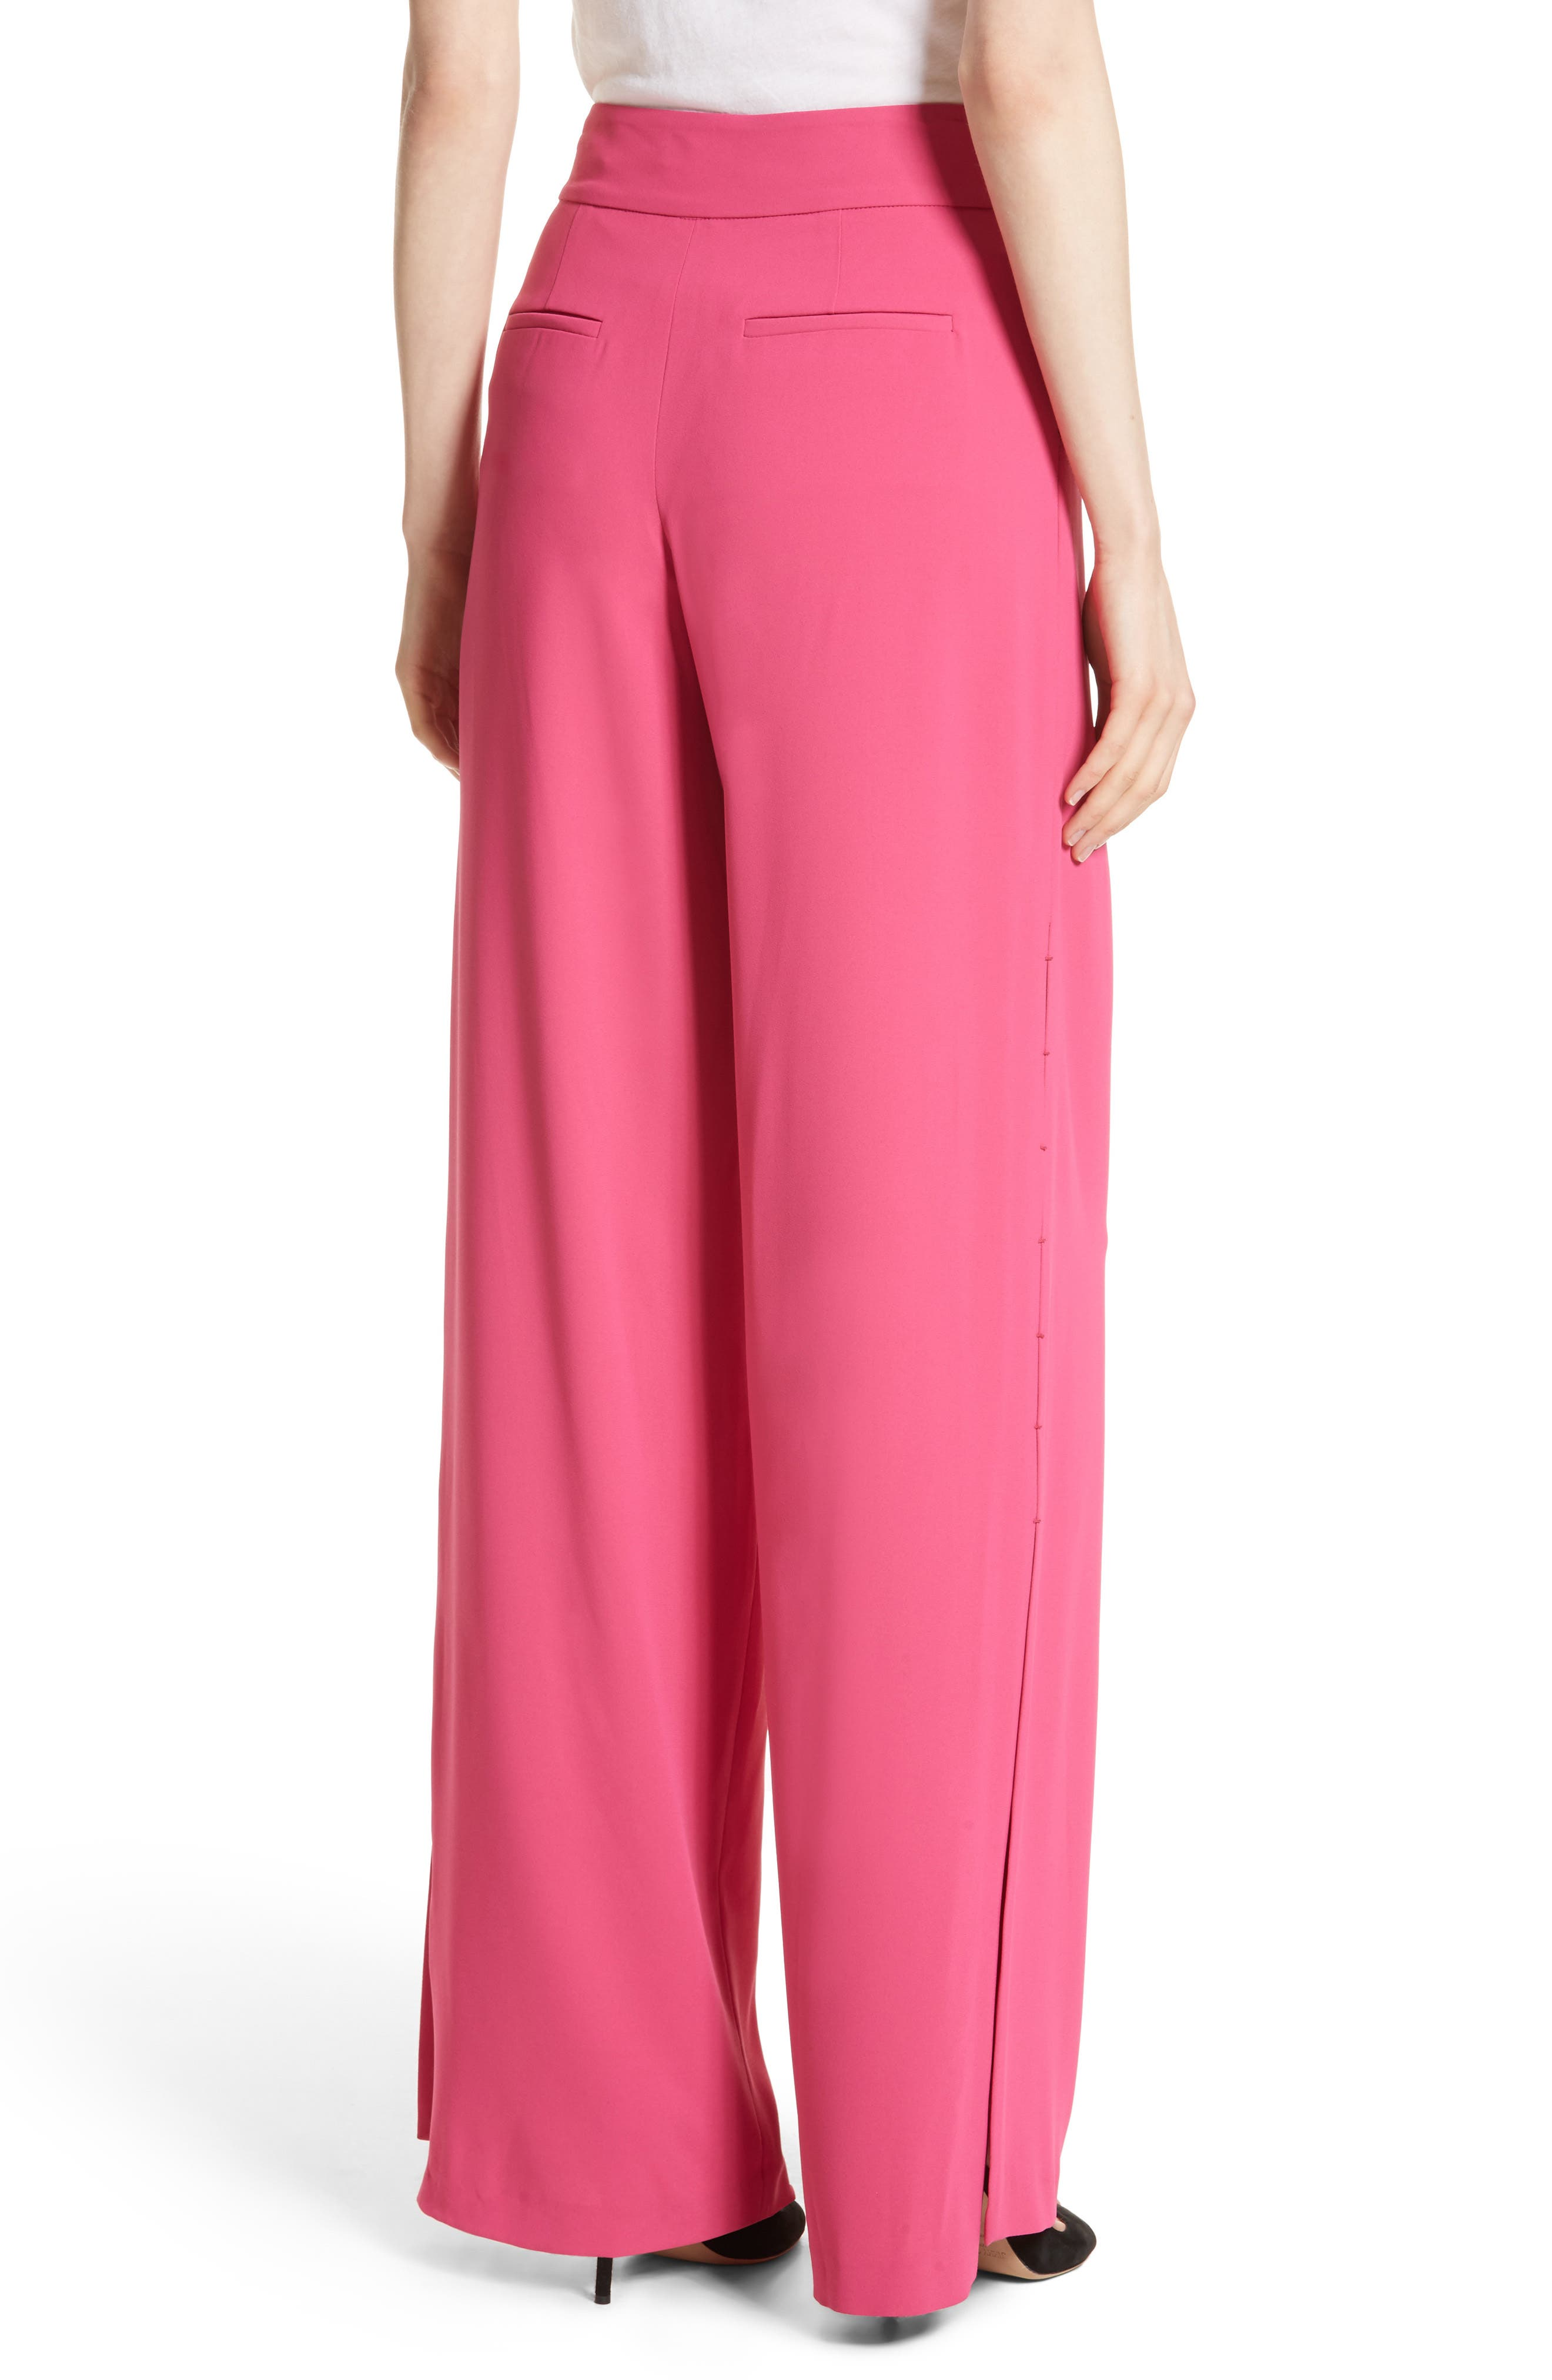 Shavon High Waist Side Slit Flare Pants,                             Alternate thumbnail 2, color,                             Fuchsia